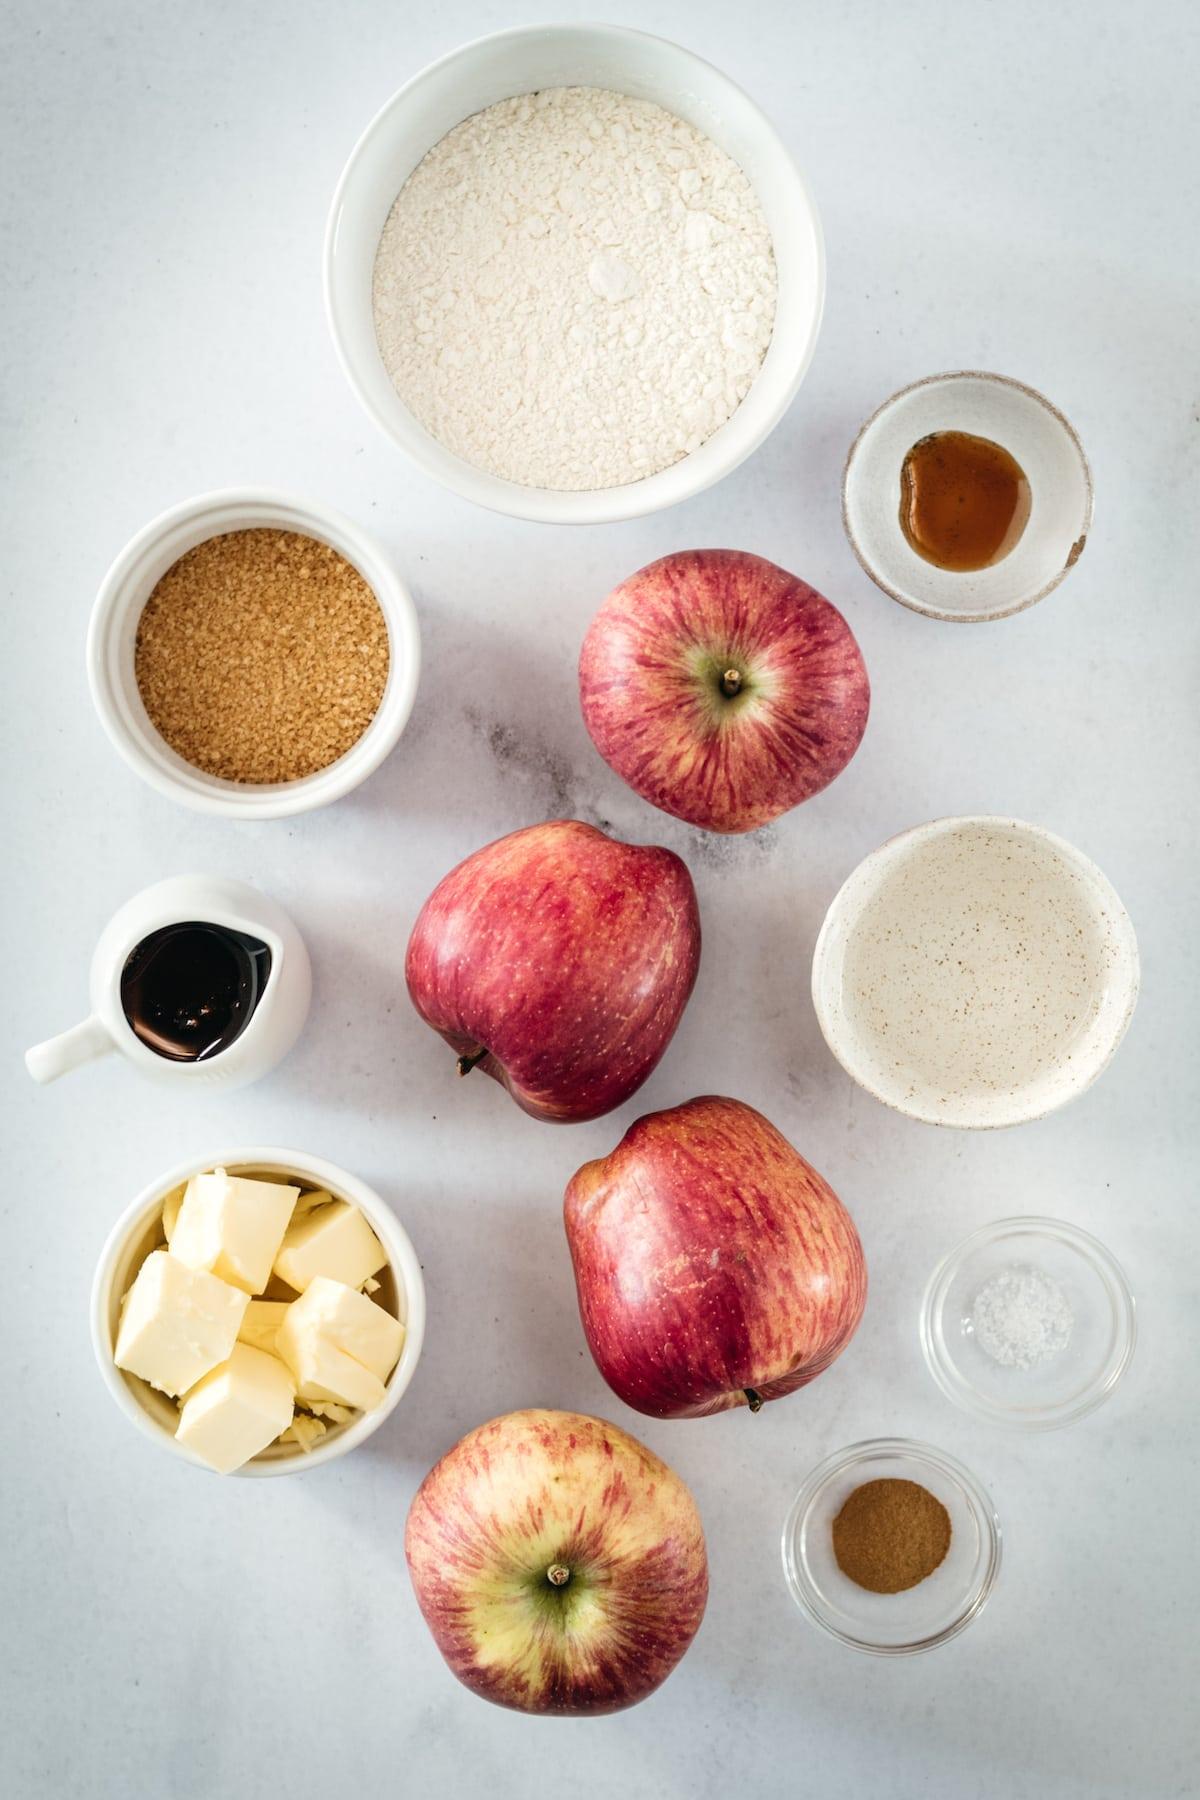 Overhead shot of Mini Caramel Apple Pie ingredients